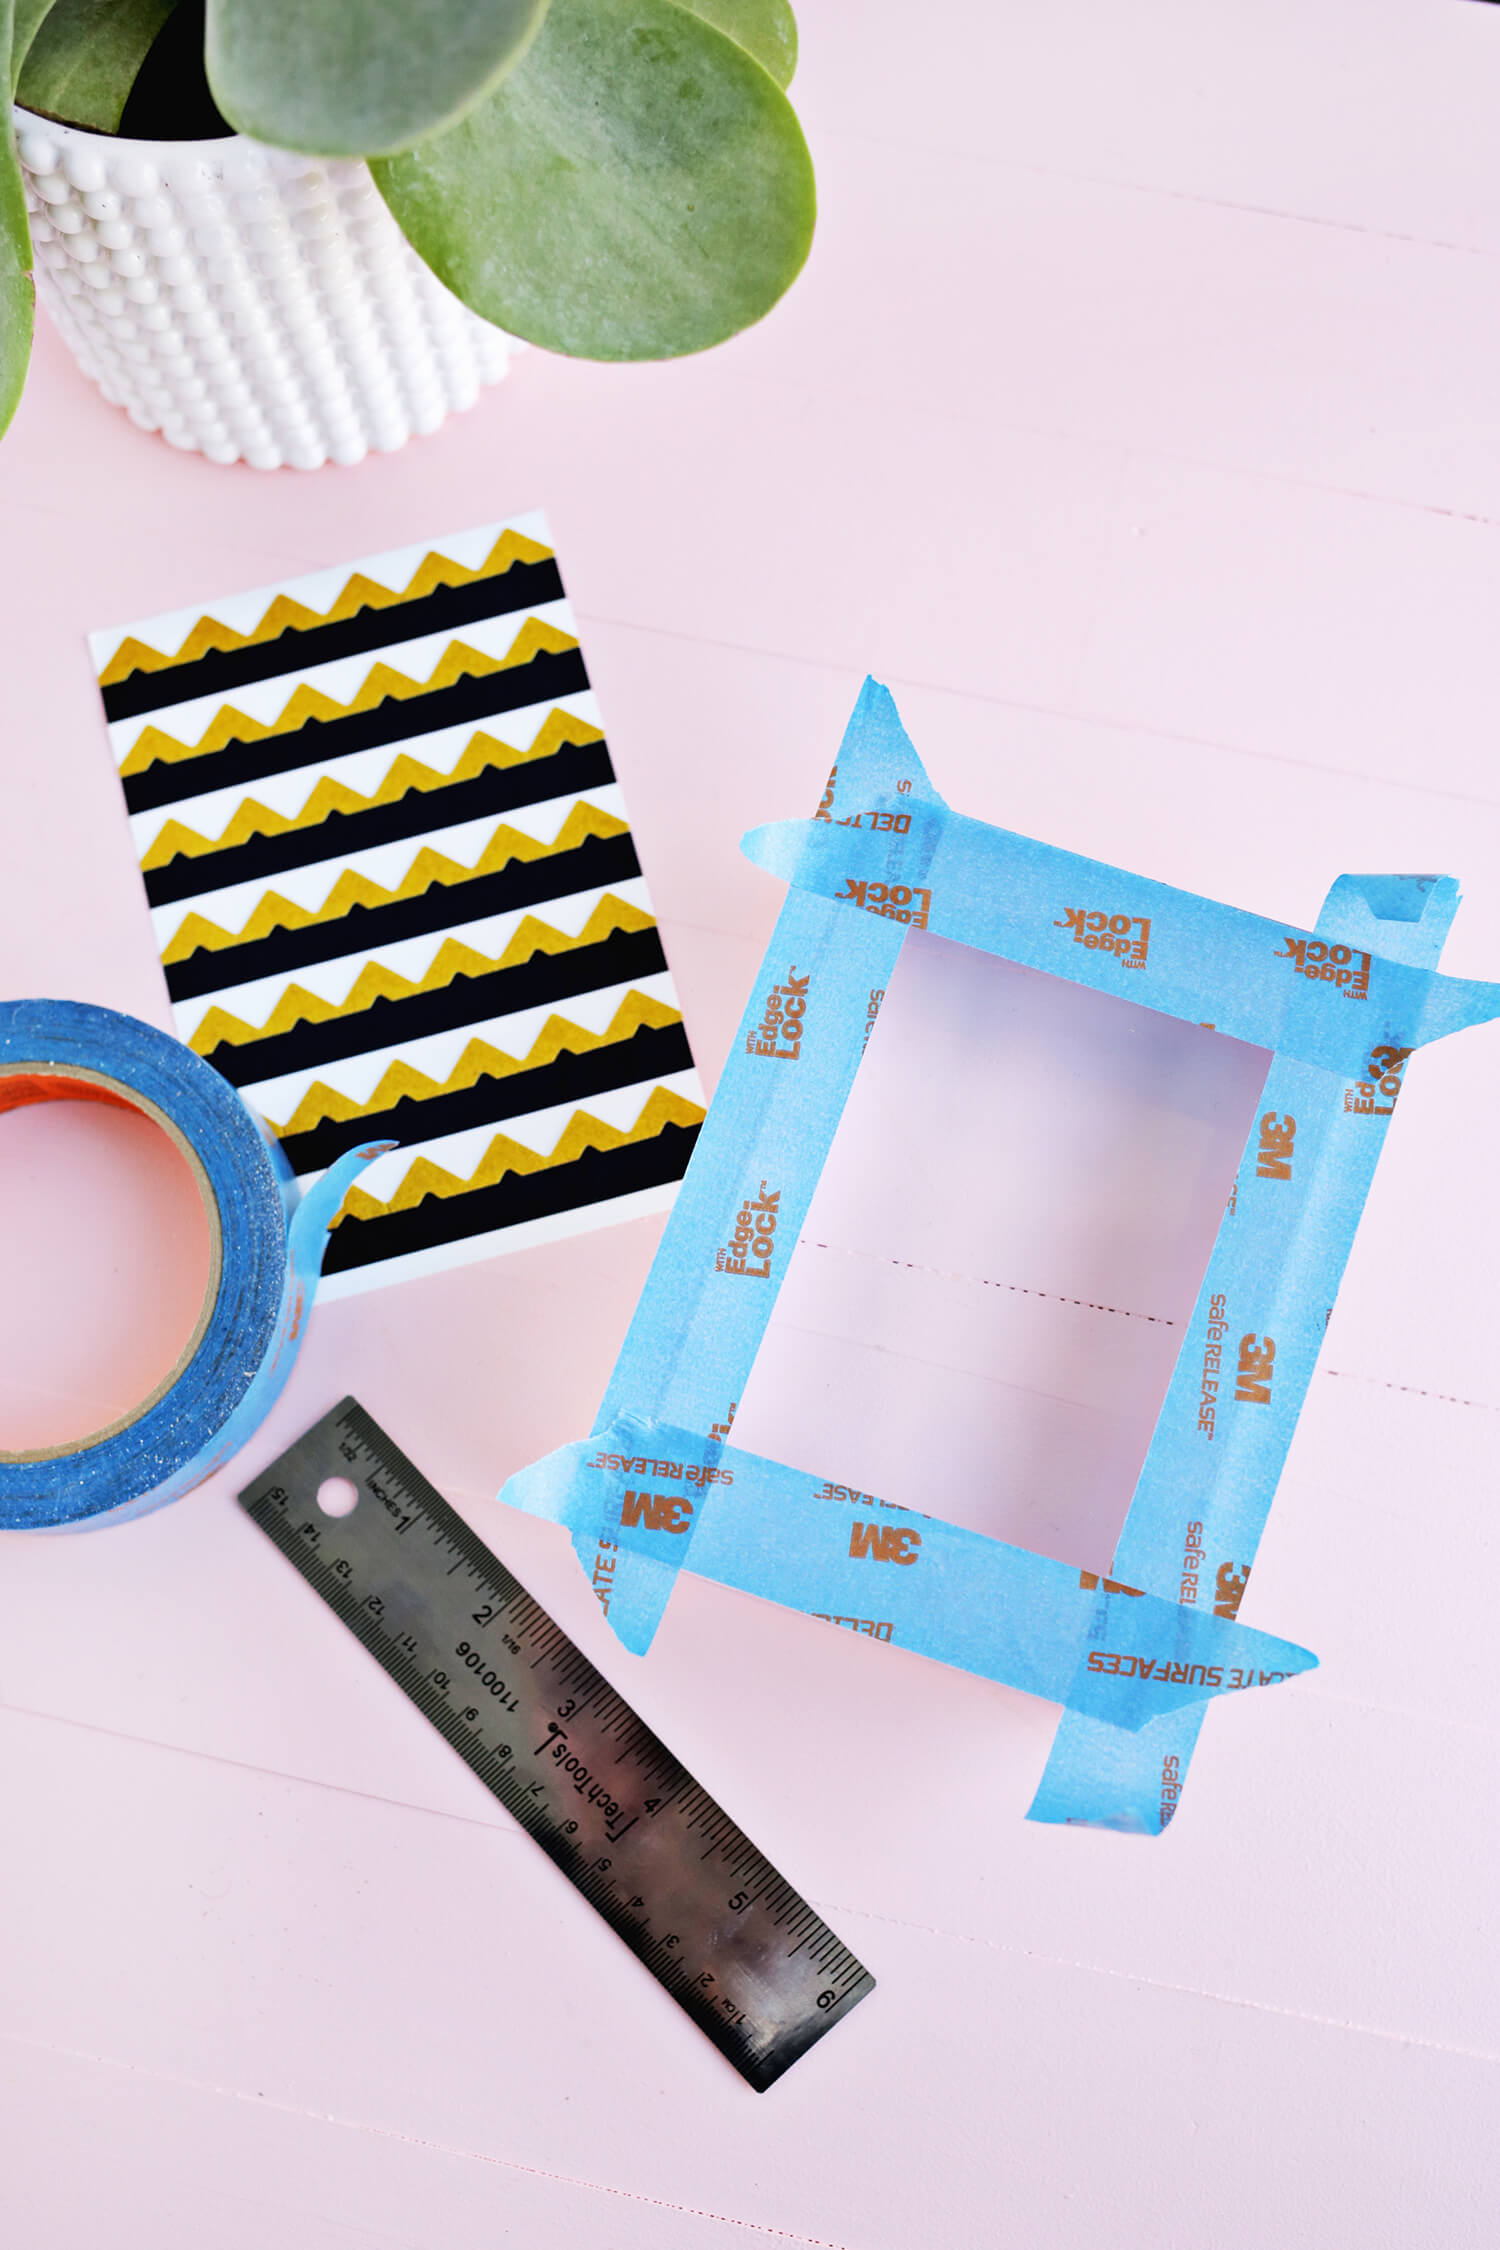 Lucite Block Photo Frame DIY (click through for tutorial)